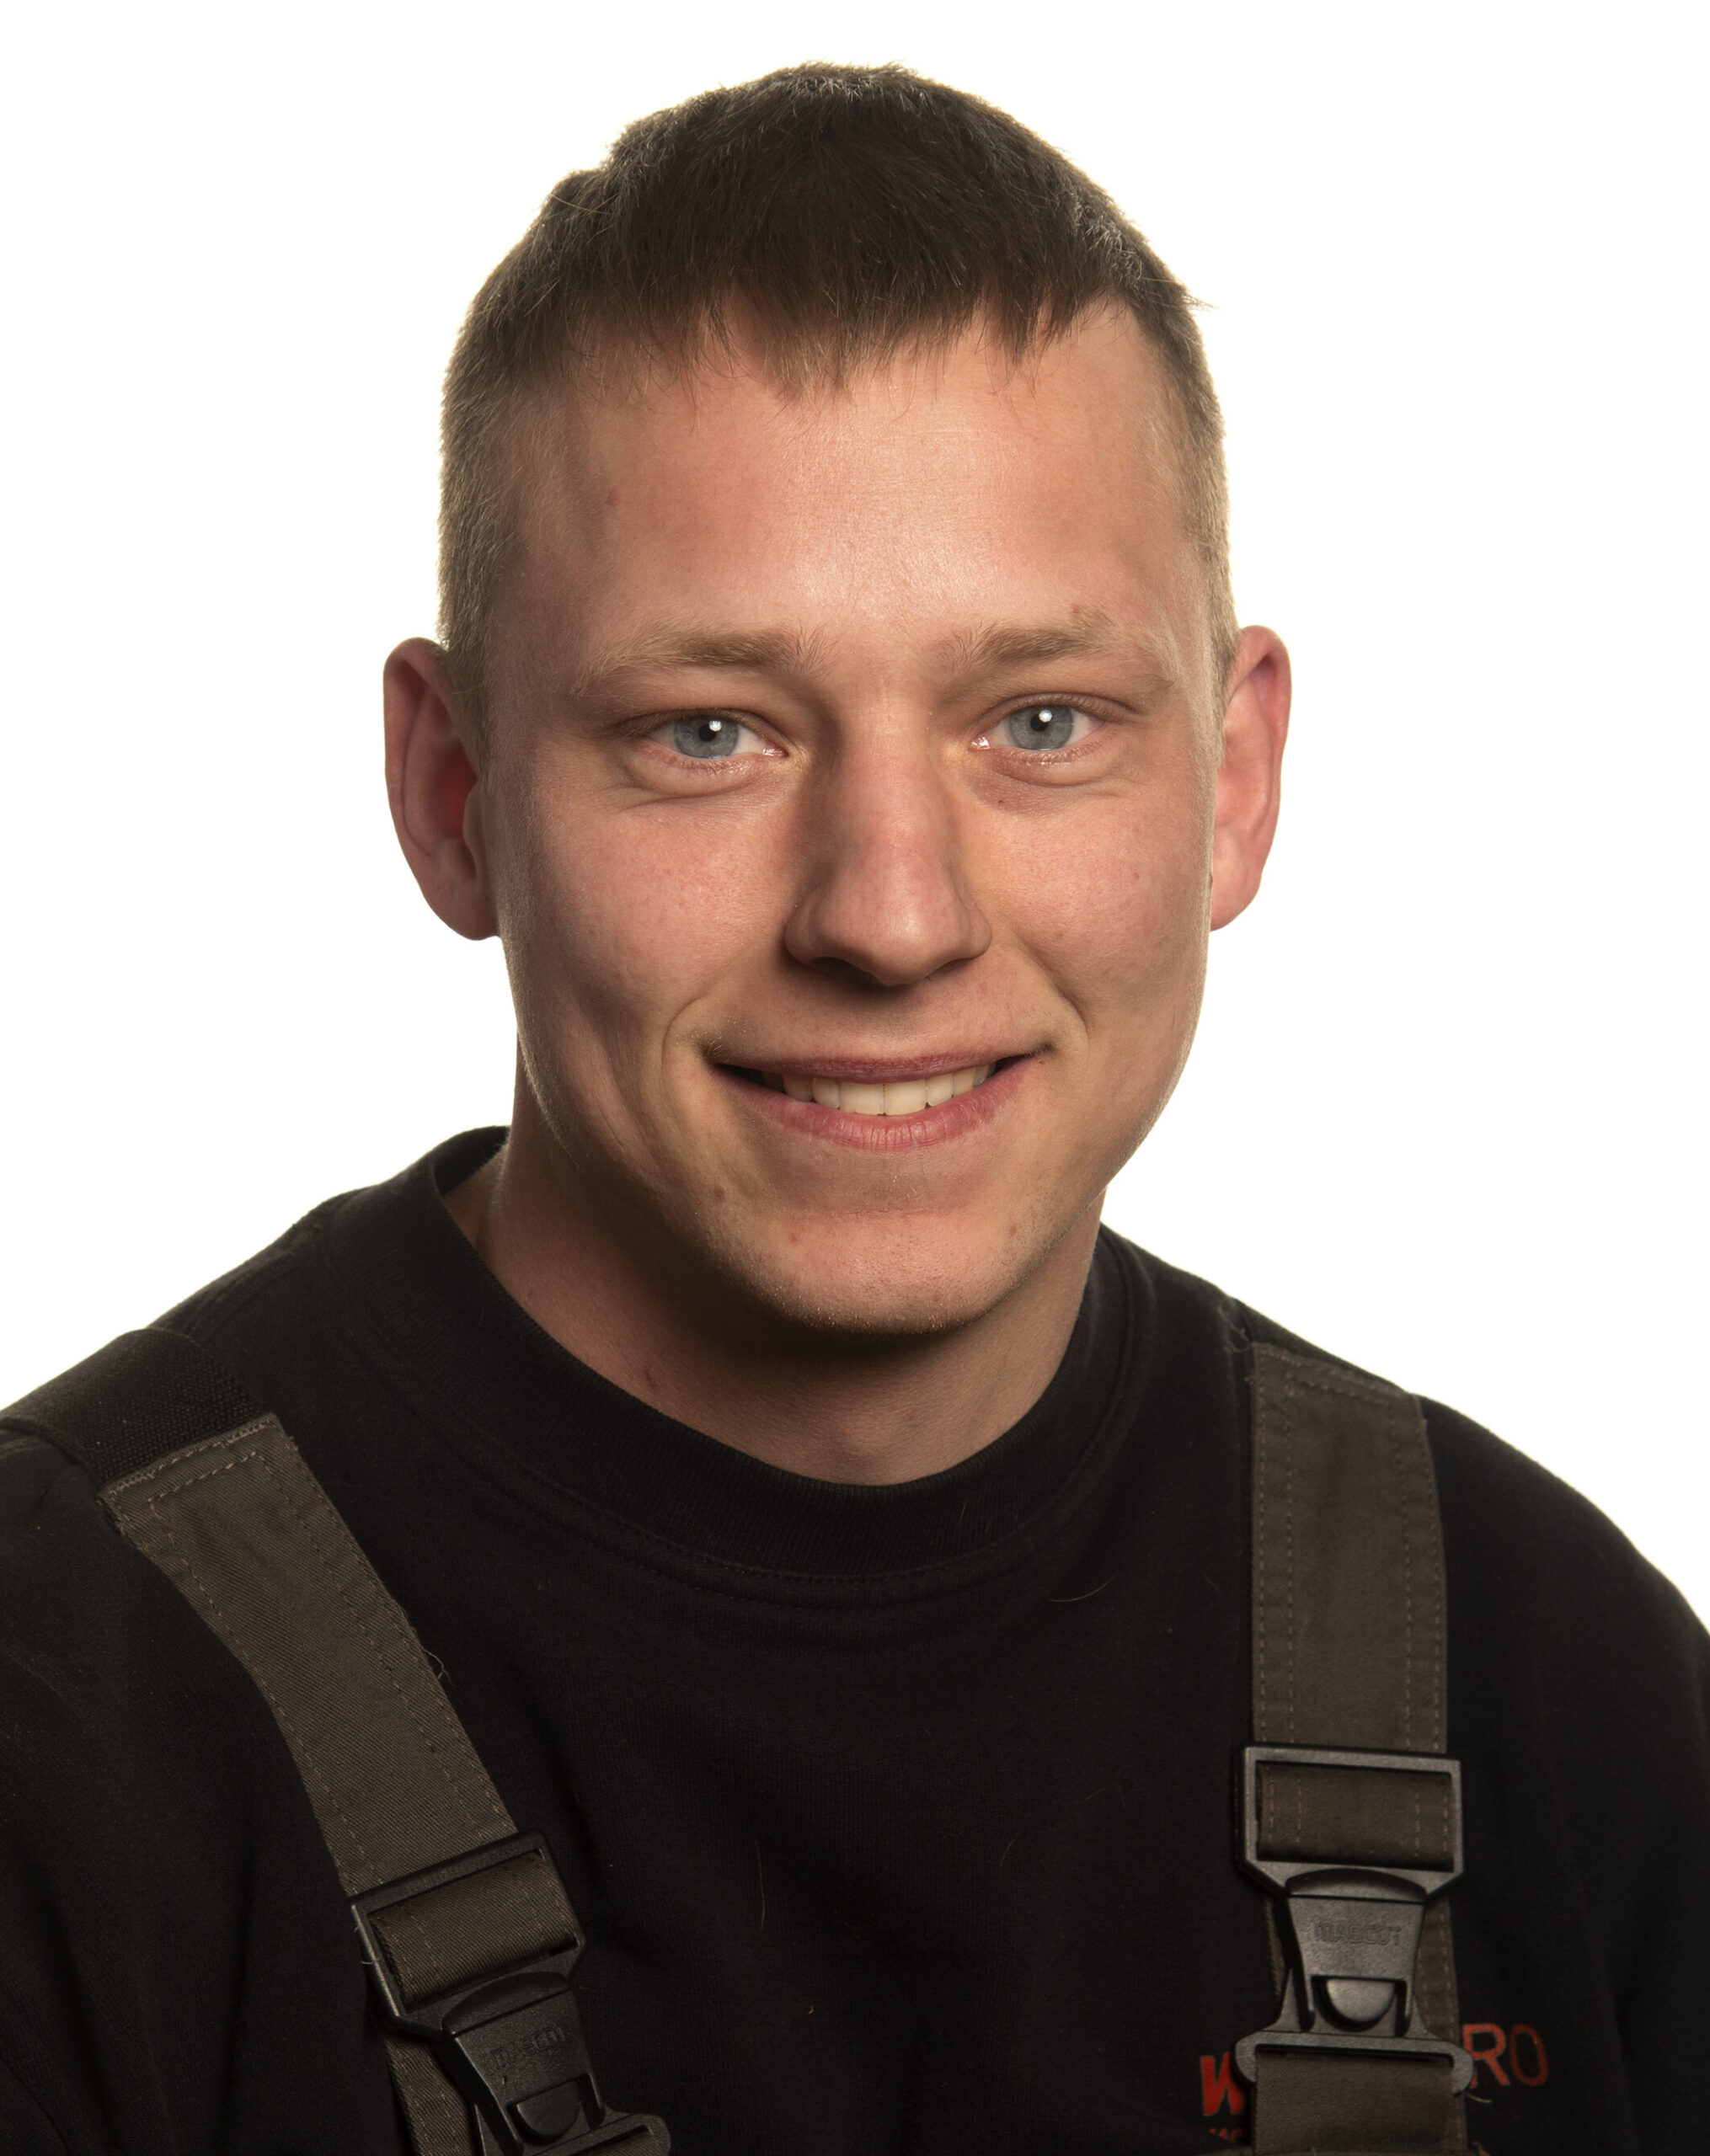 Johan Andreasen